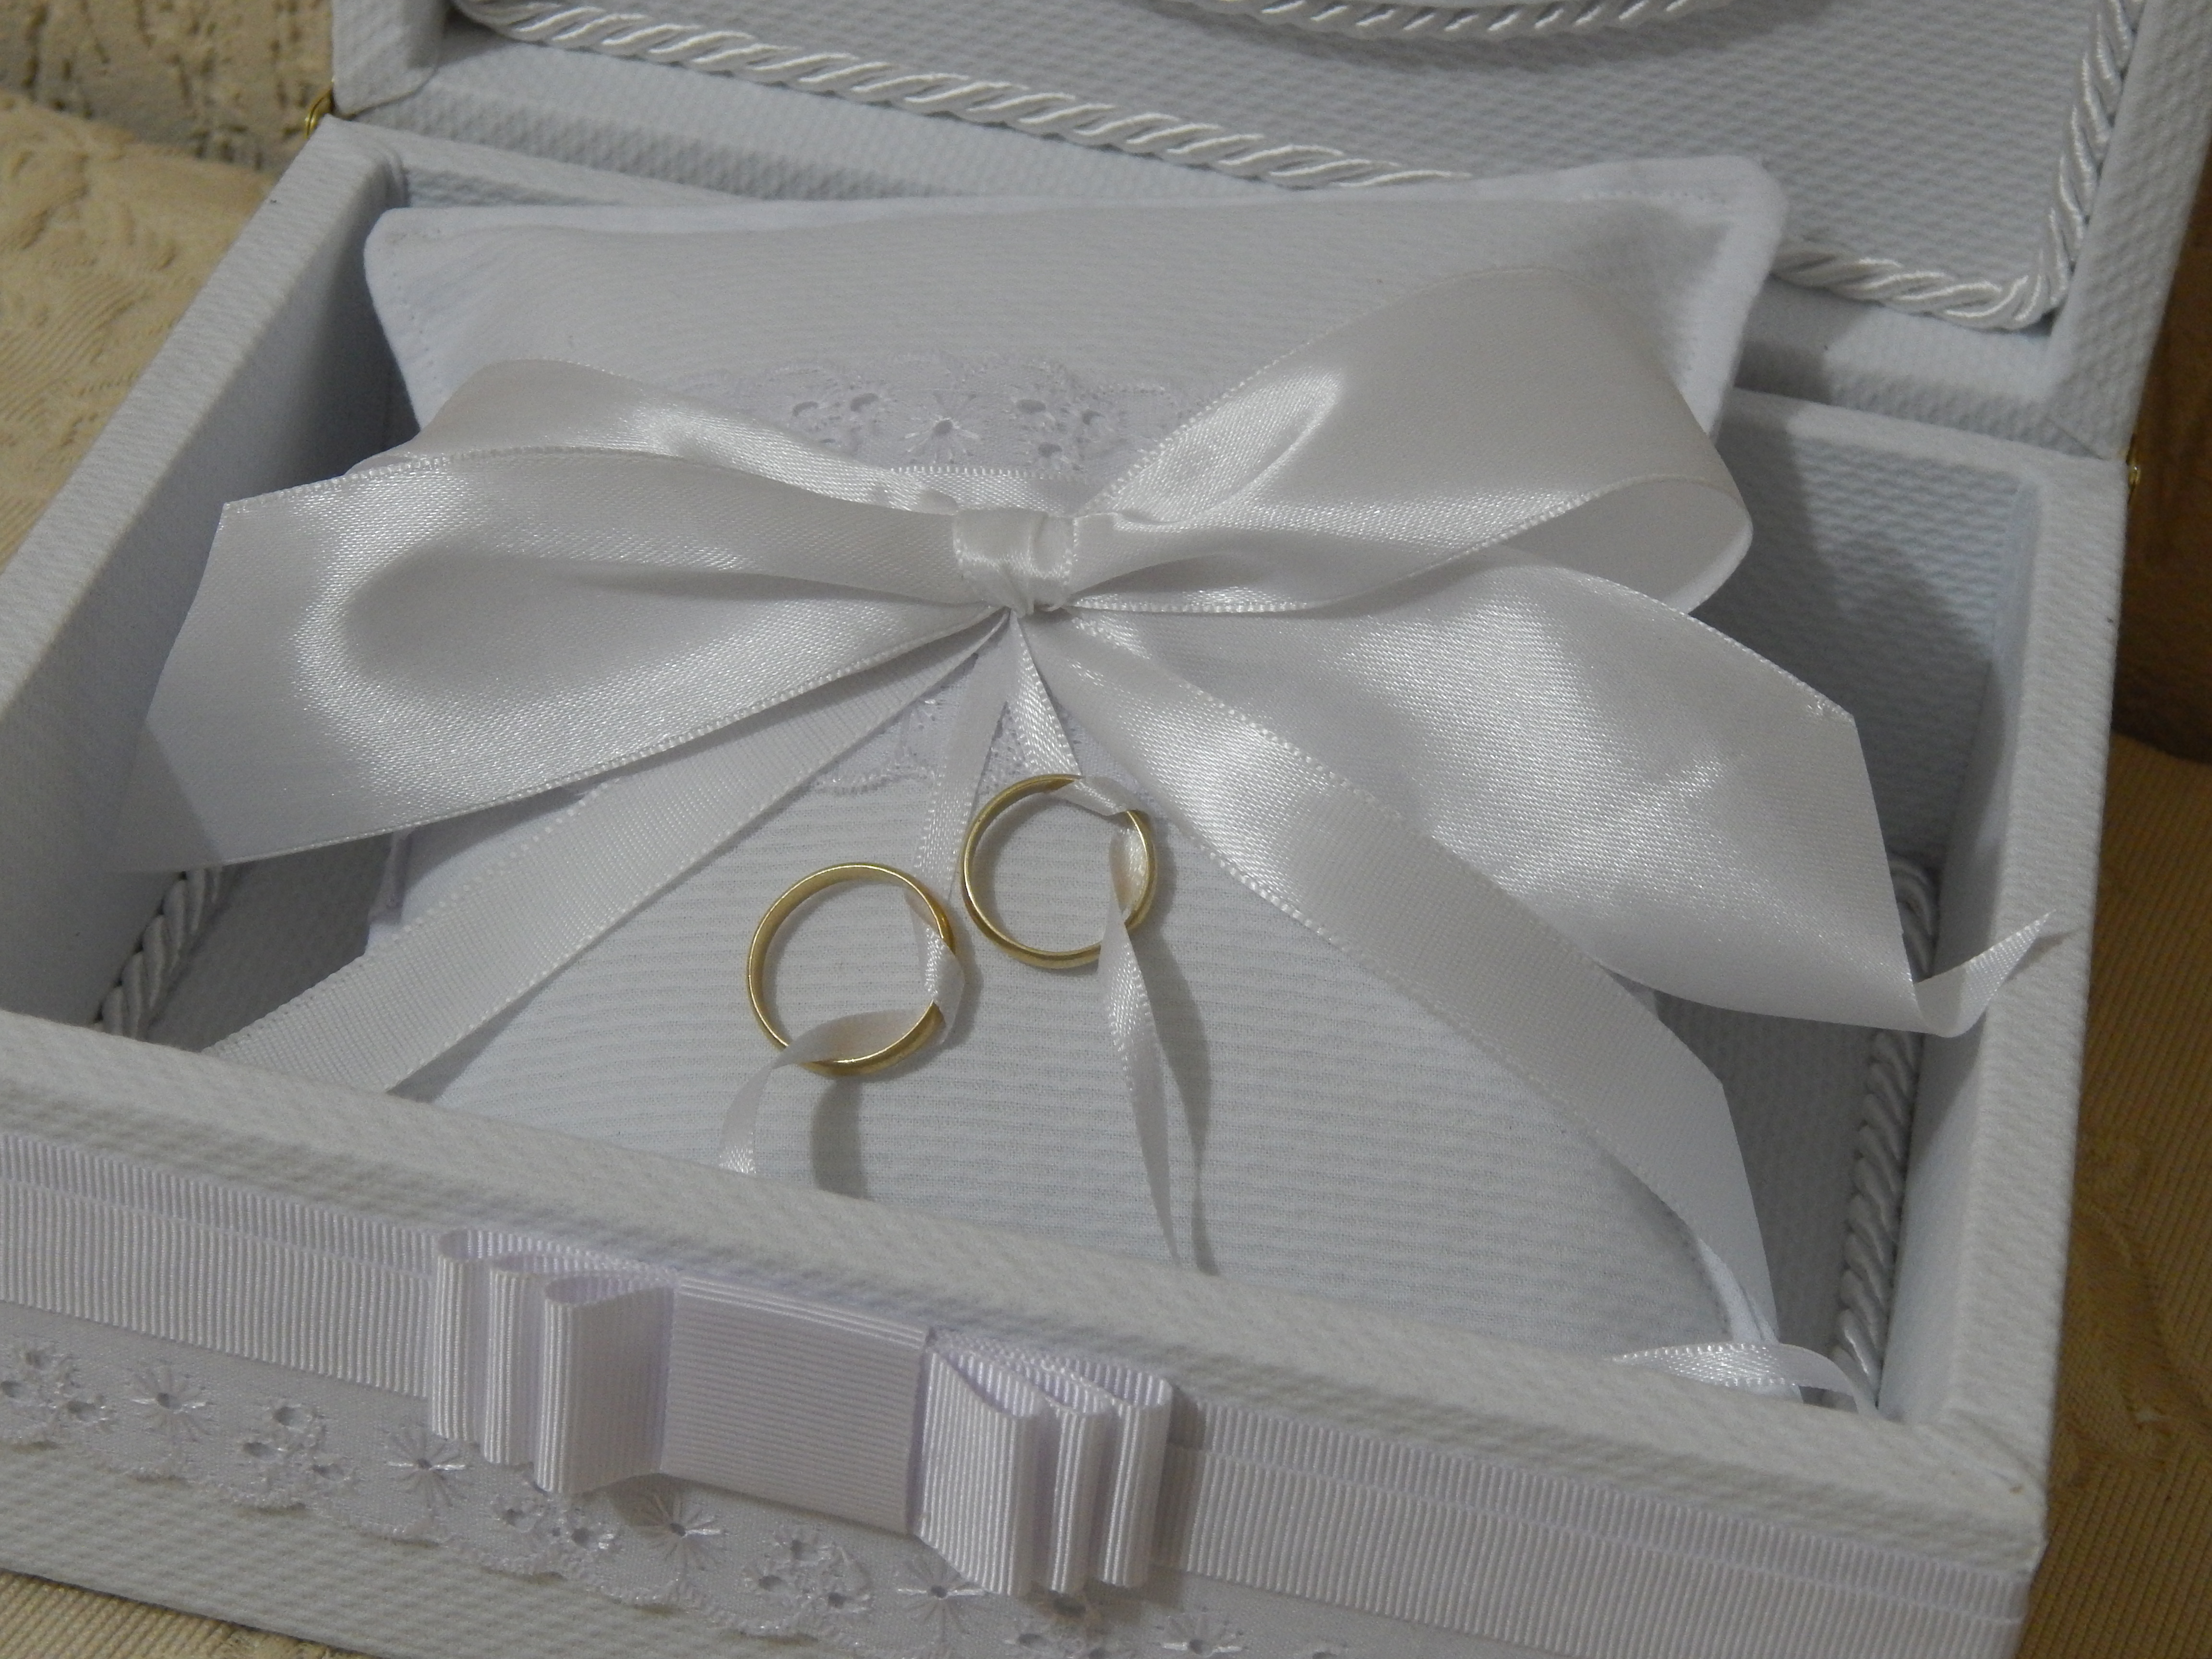 caixa para aliancas de casamento almofada caixa para aliancas de  #463E30 4608x3456